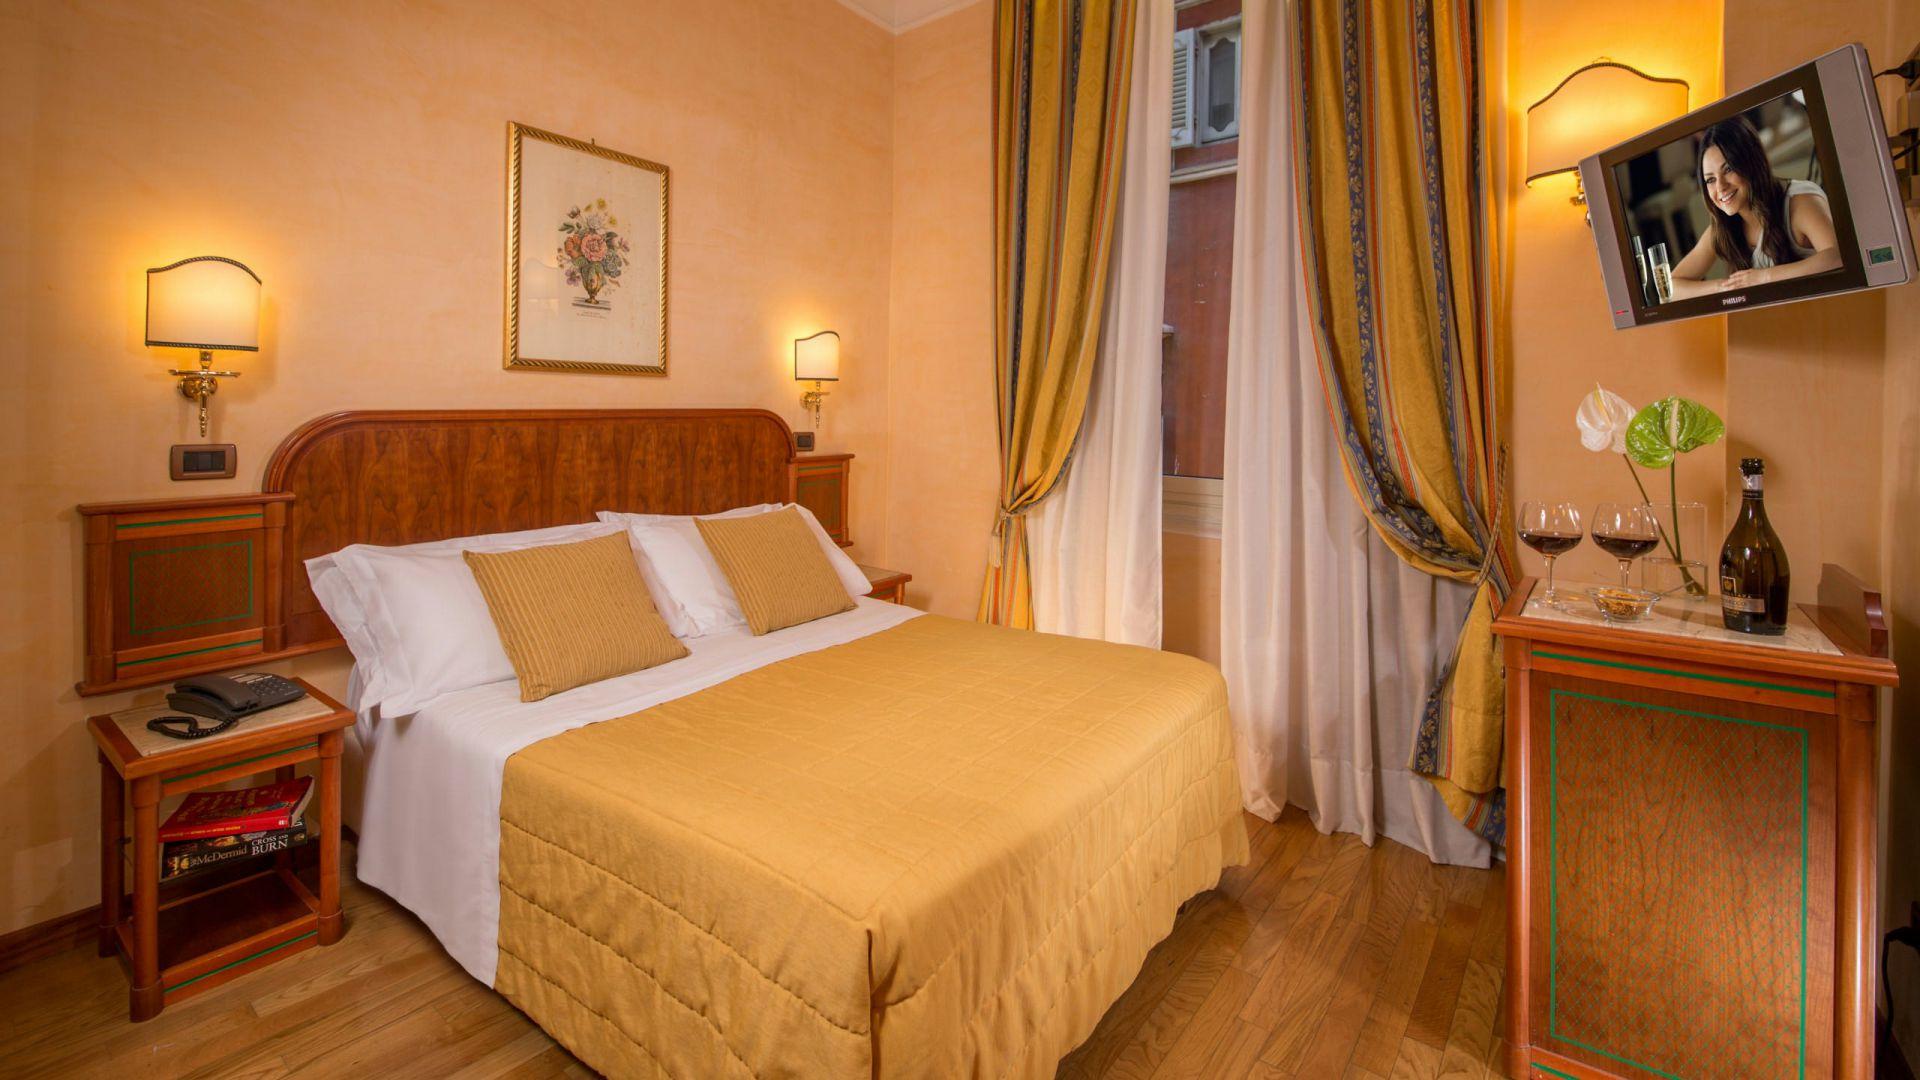 Hotel Regno Rome Cities Sardatur Holidays